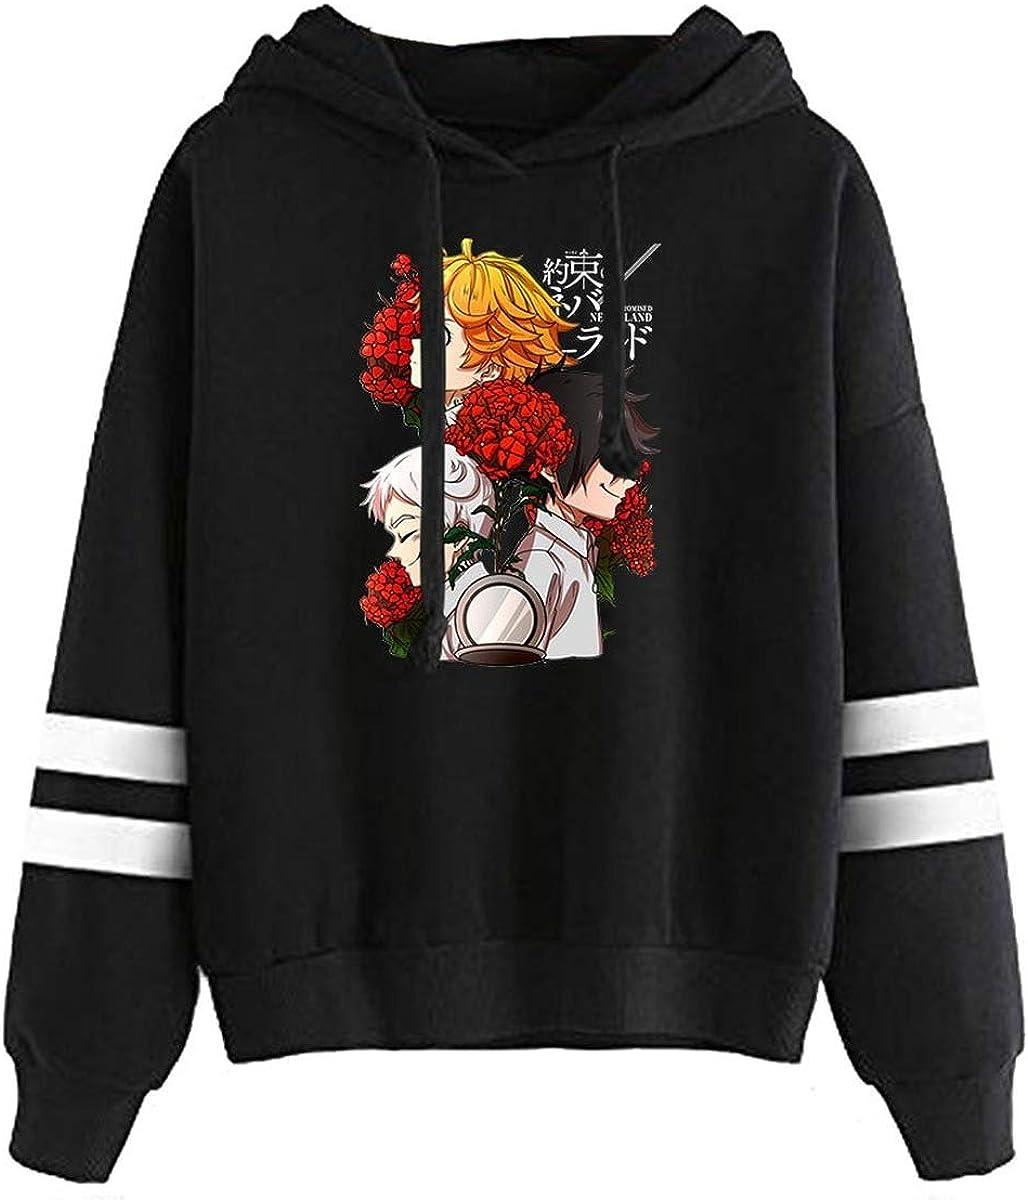 The Promised Neverland Season 2 Pullover Hoodie 2D Print Unisex Parallel Bars Bagless Hooded Warm Sweatshirt